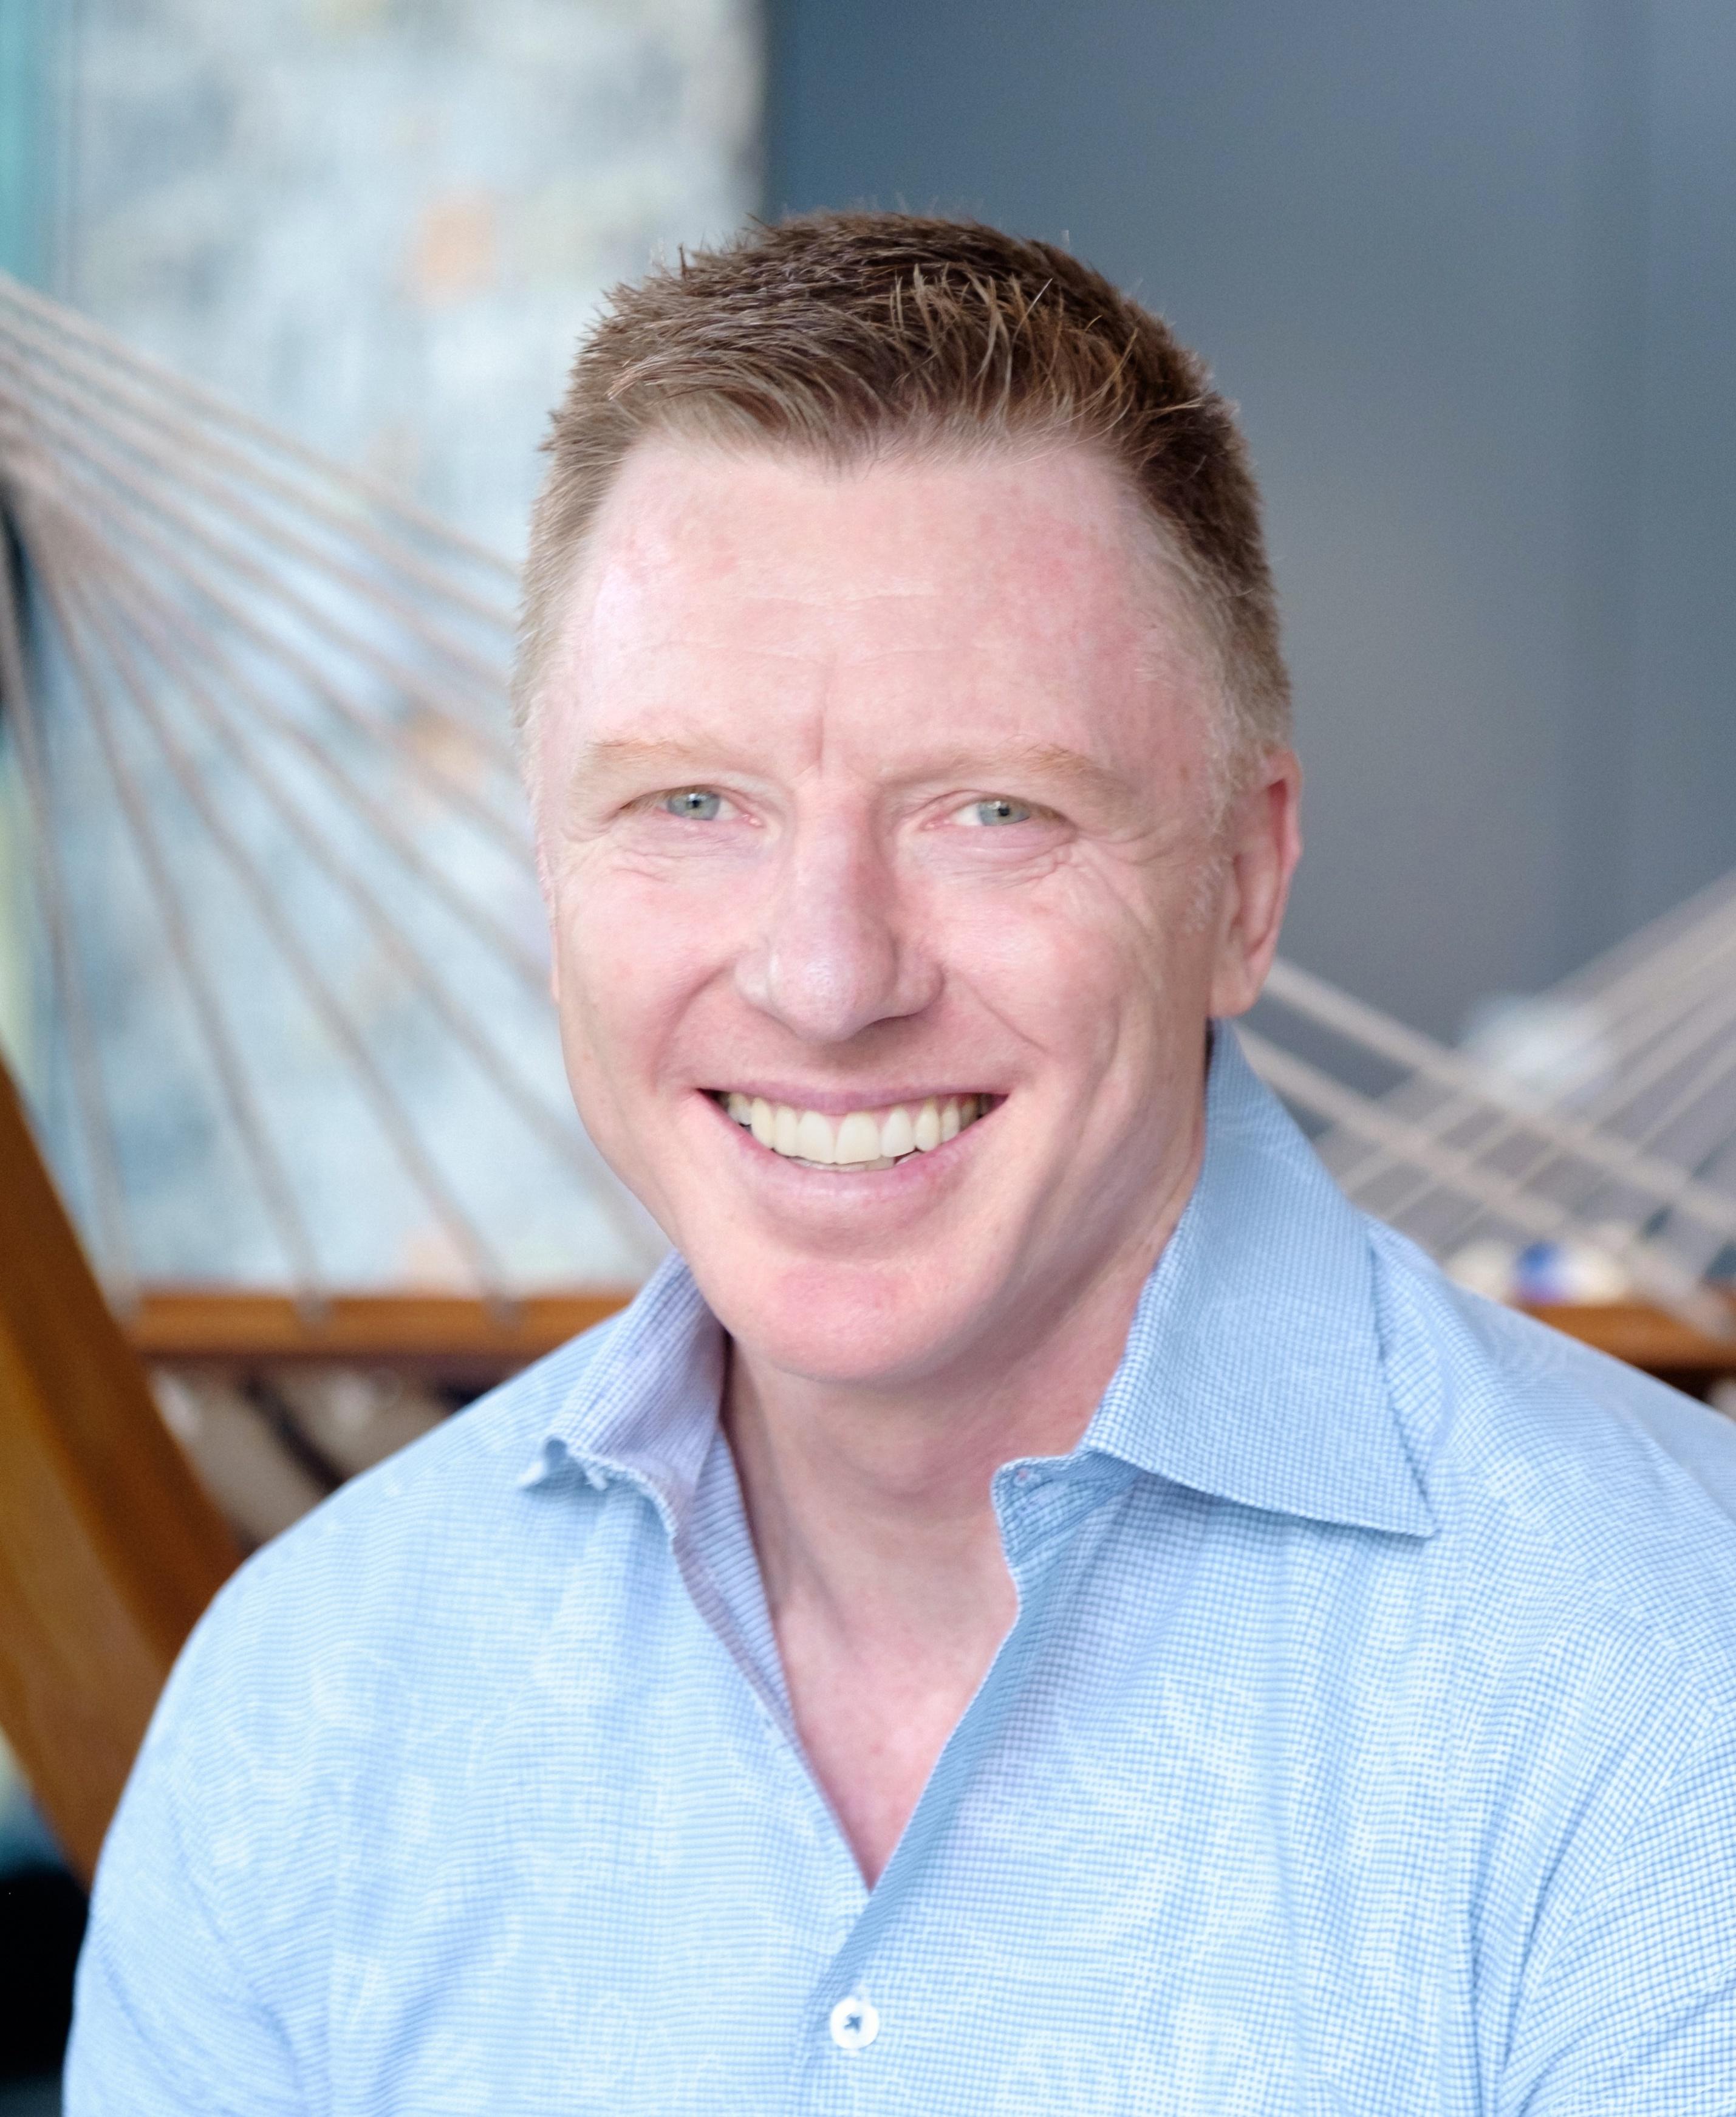 Google's Kevin Ackhurst Joins HubSpot as ANZ Sales Director